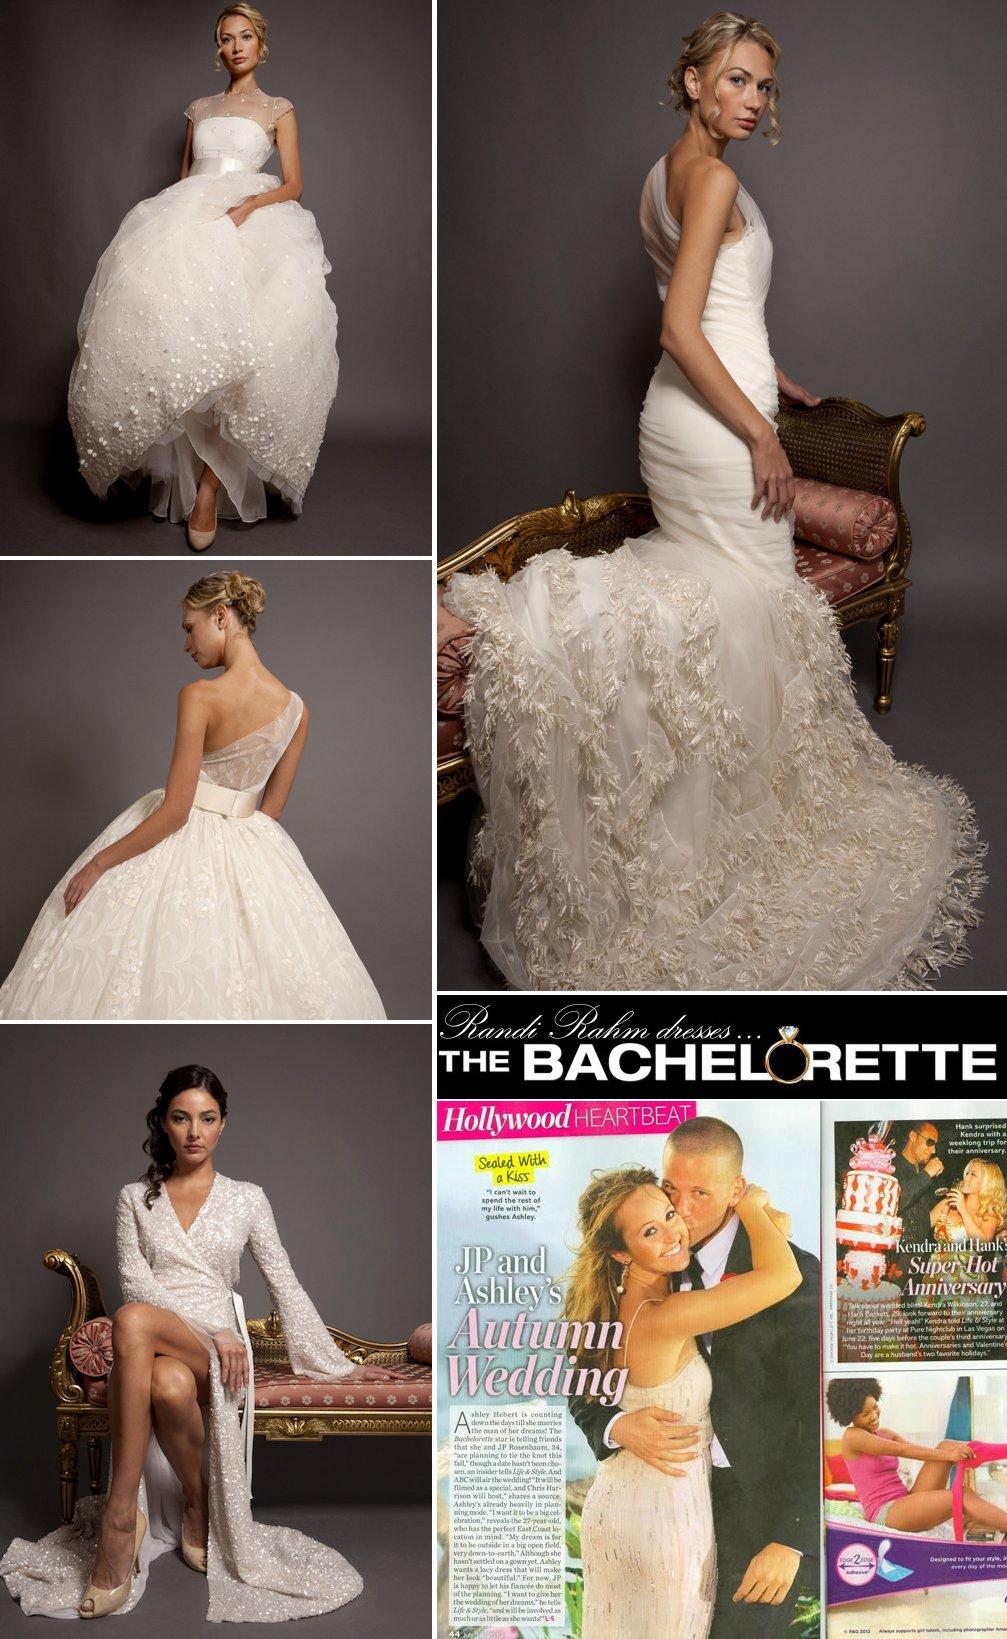 Ashley-hebert-wedding-dress-designer-randi-rahm-bridal-gowns-4.full